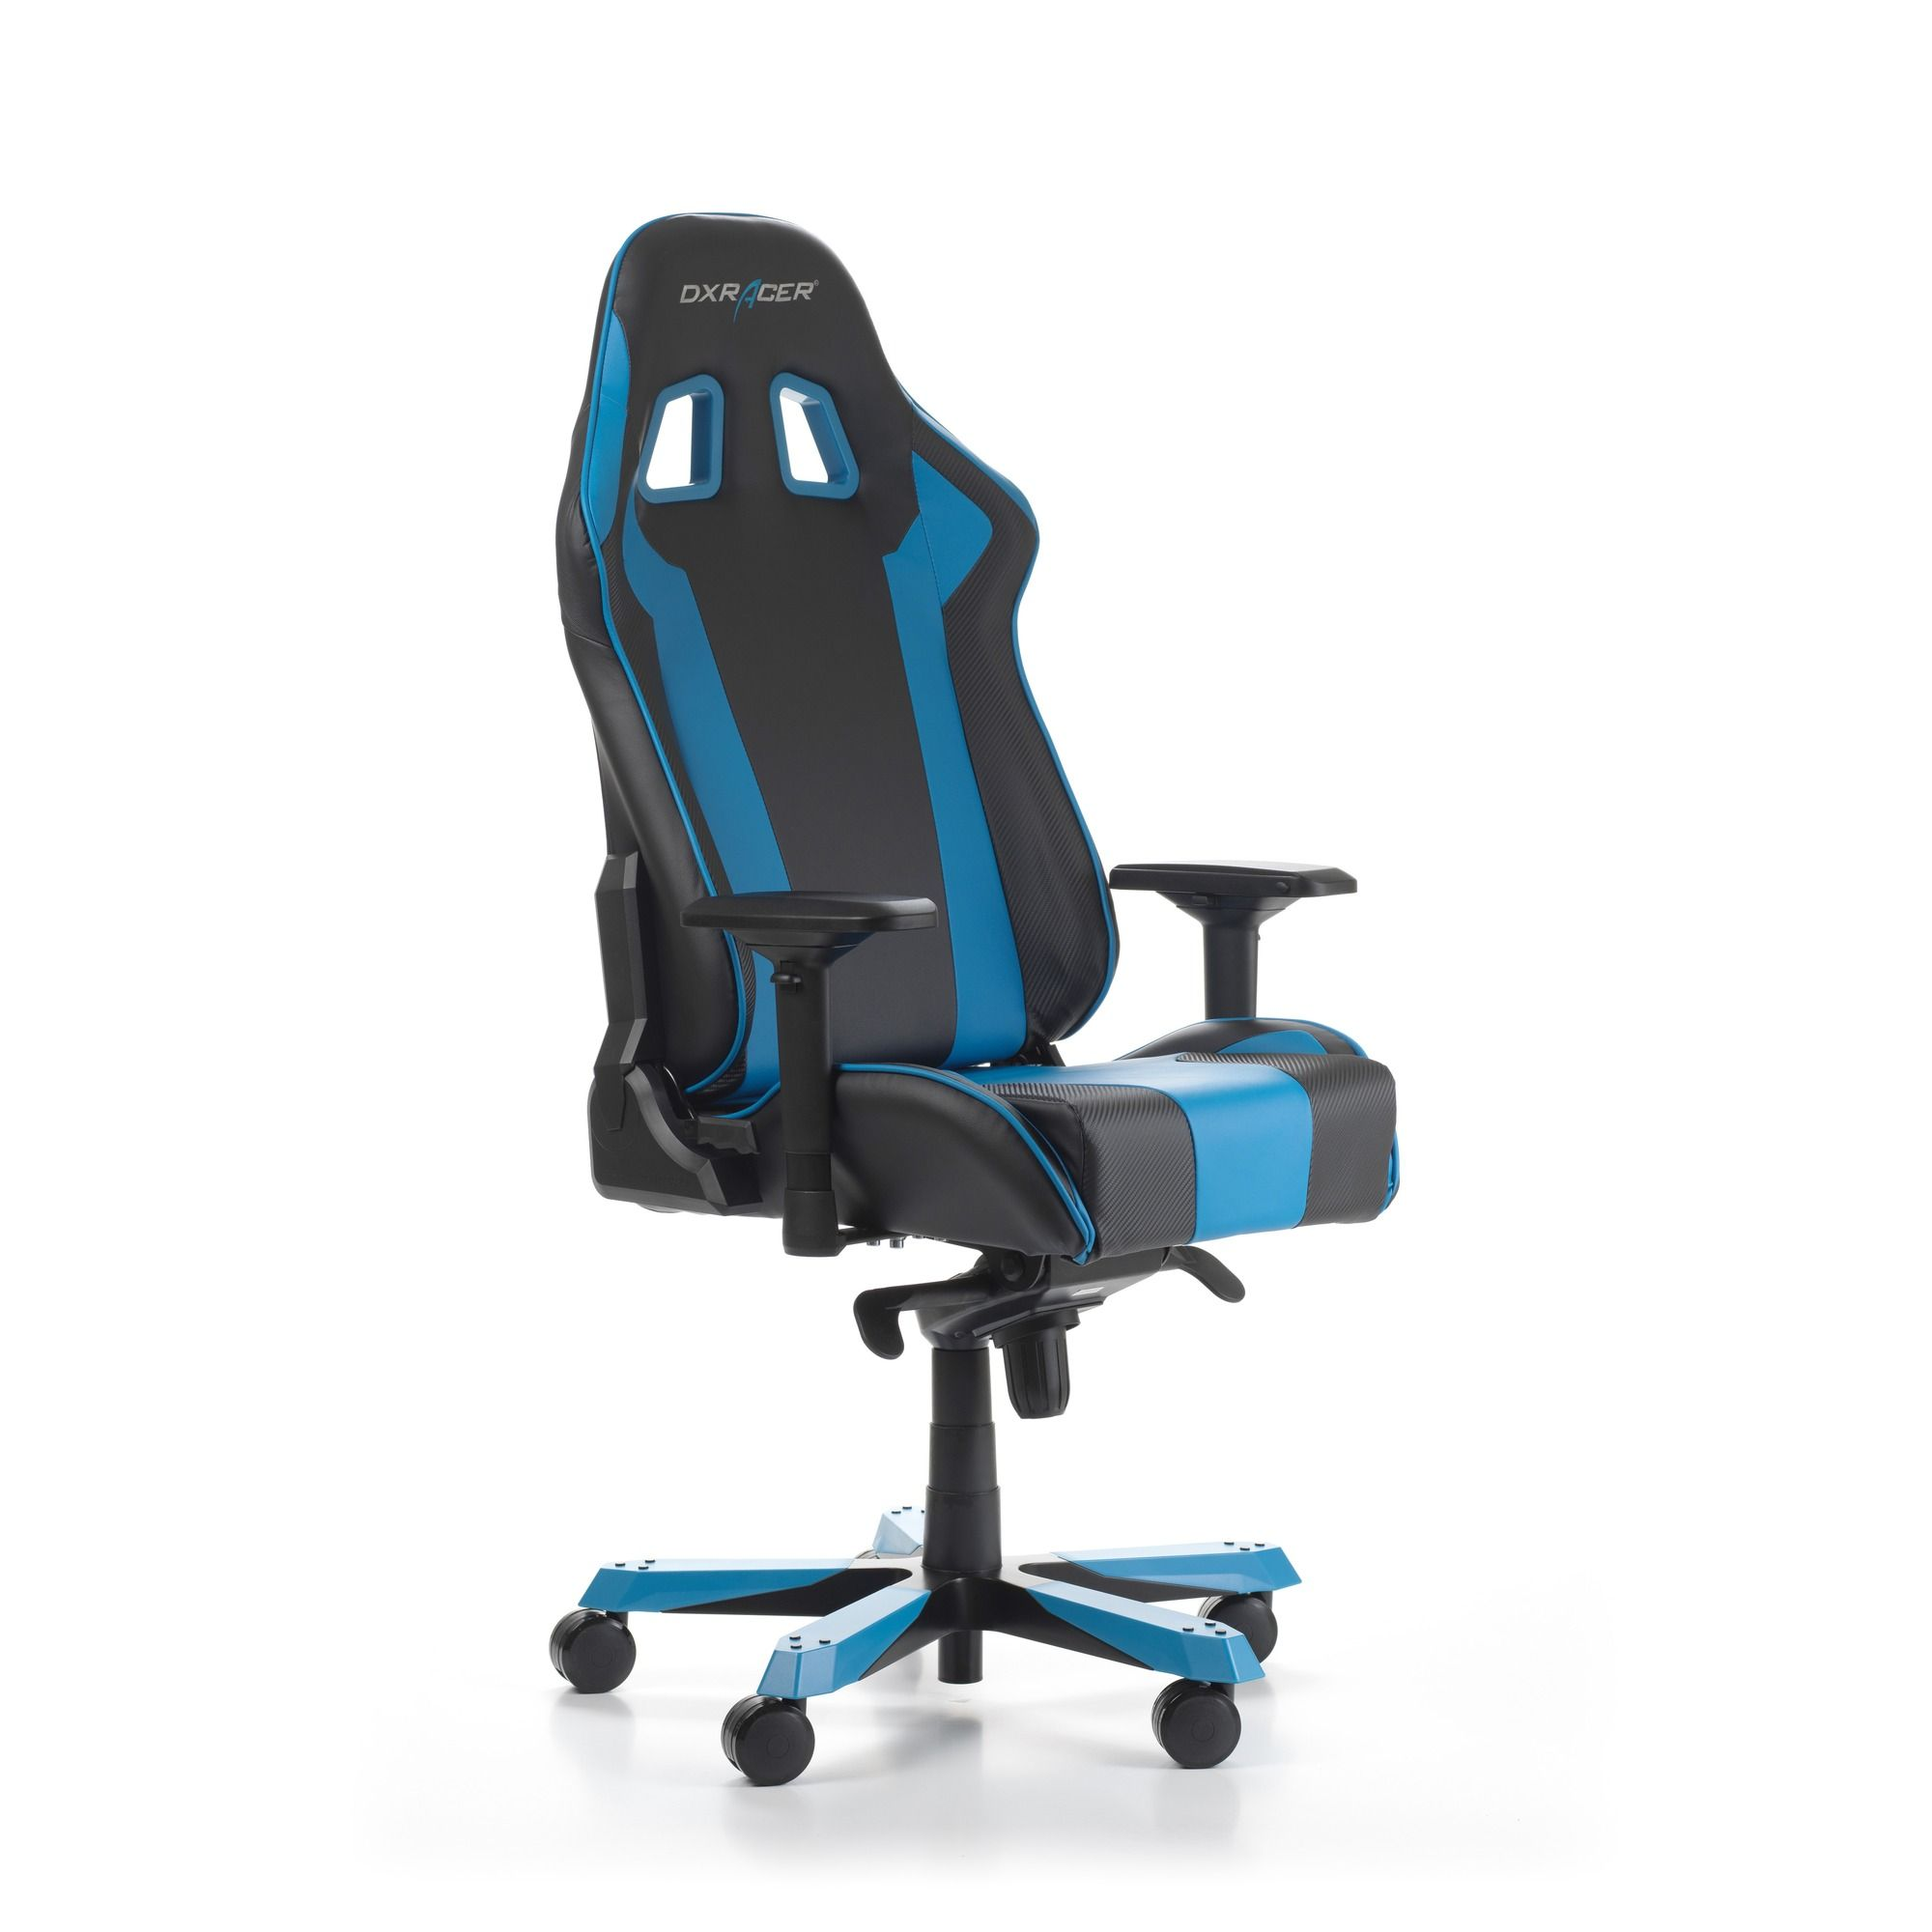 Геймърски стол DXRacer - серия KING, черен/син - OH/KS06/NB - 9